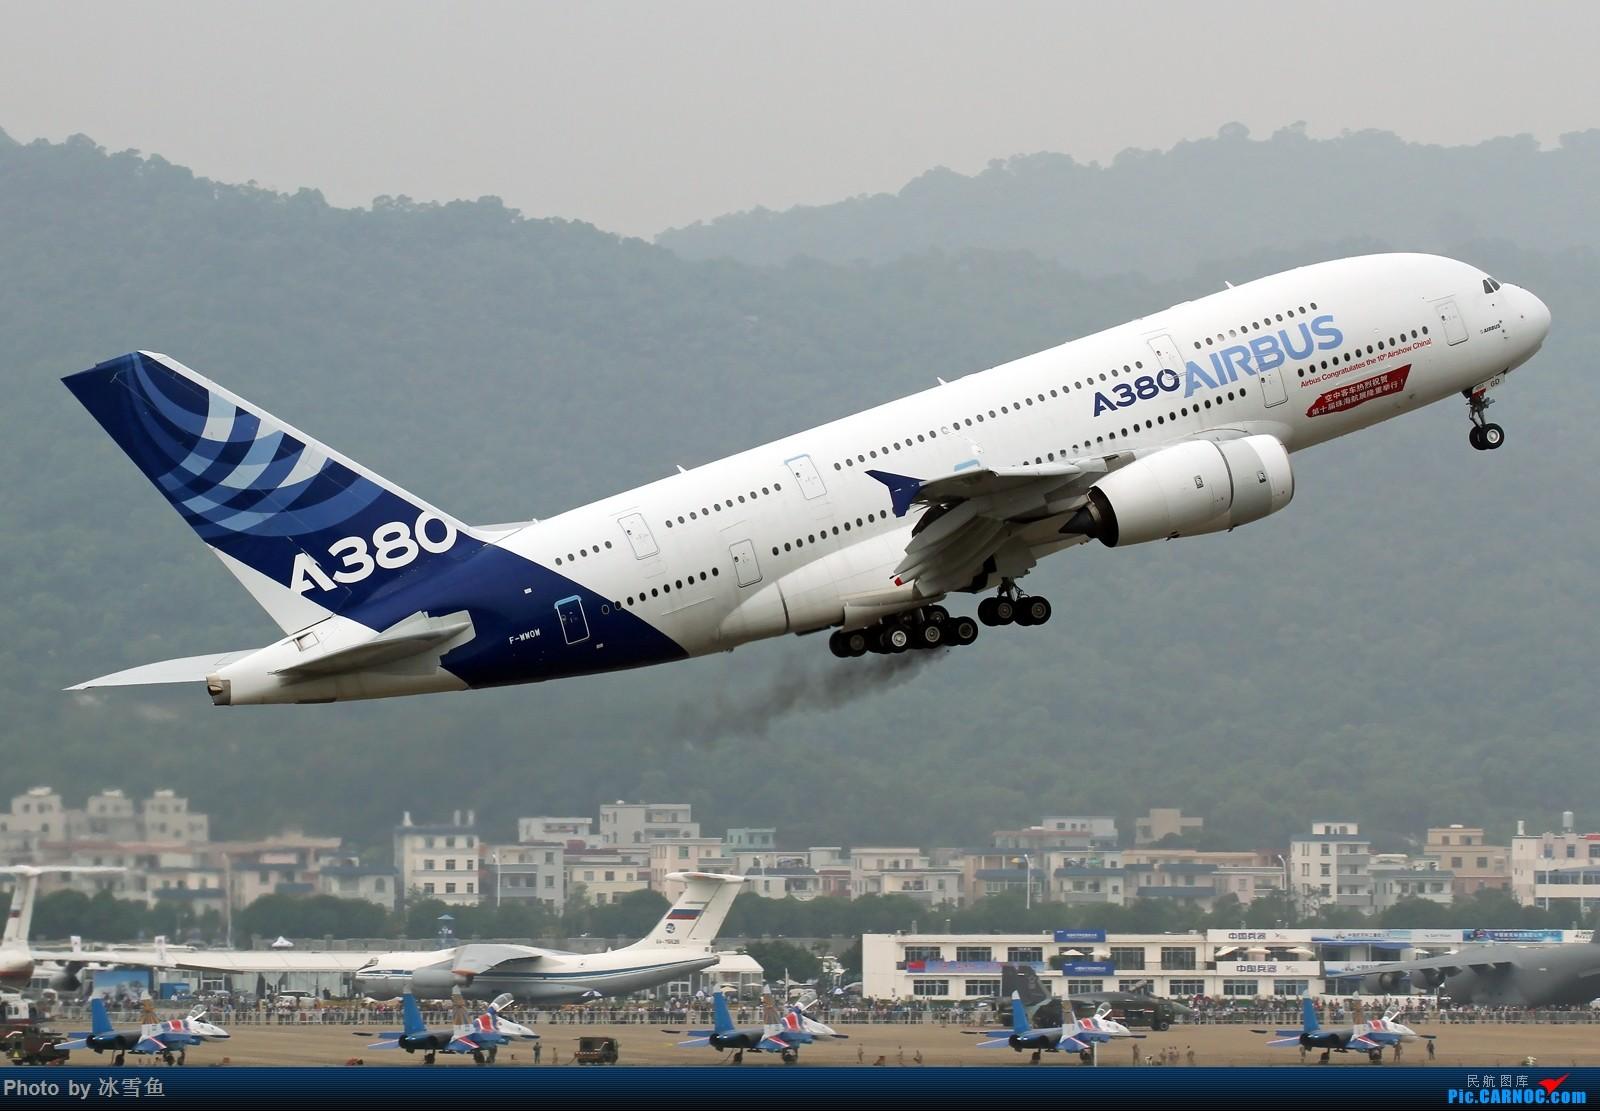 Re:[原创]【BLDDQ-昆明飞友会】又到一年航展时——人更多、价更高............ AIRBUS A380 F-WWOW 中国珠海金湾机场